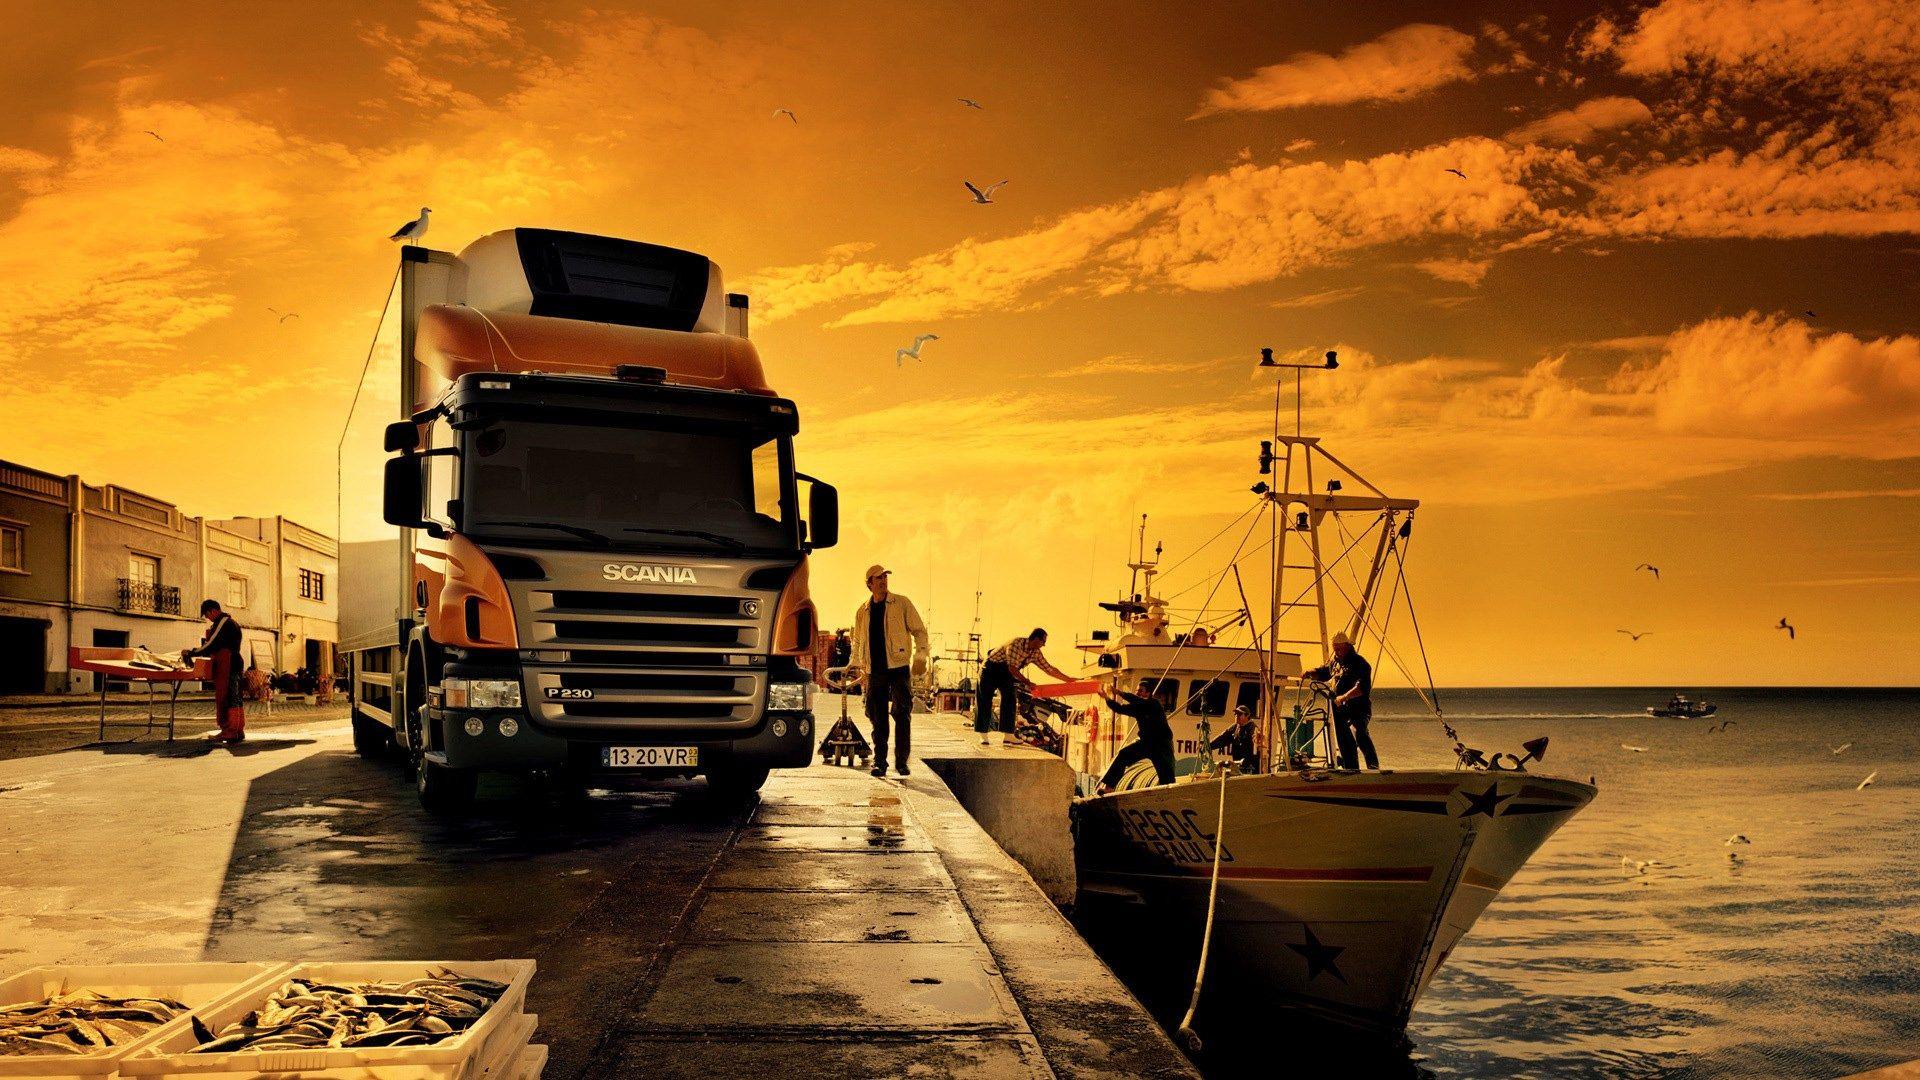 Awesome Orange Scania Truck Wallpaper Pc Scania Lkw Lkw Trucks